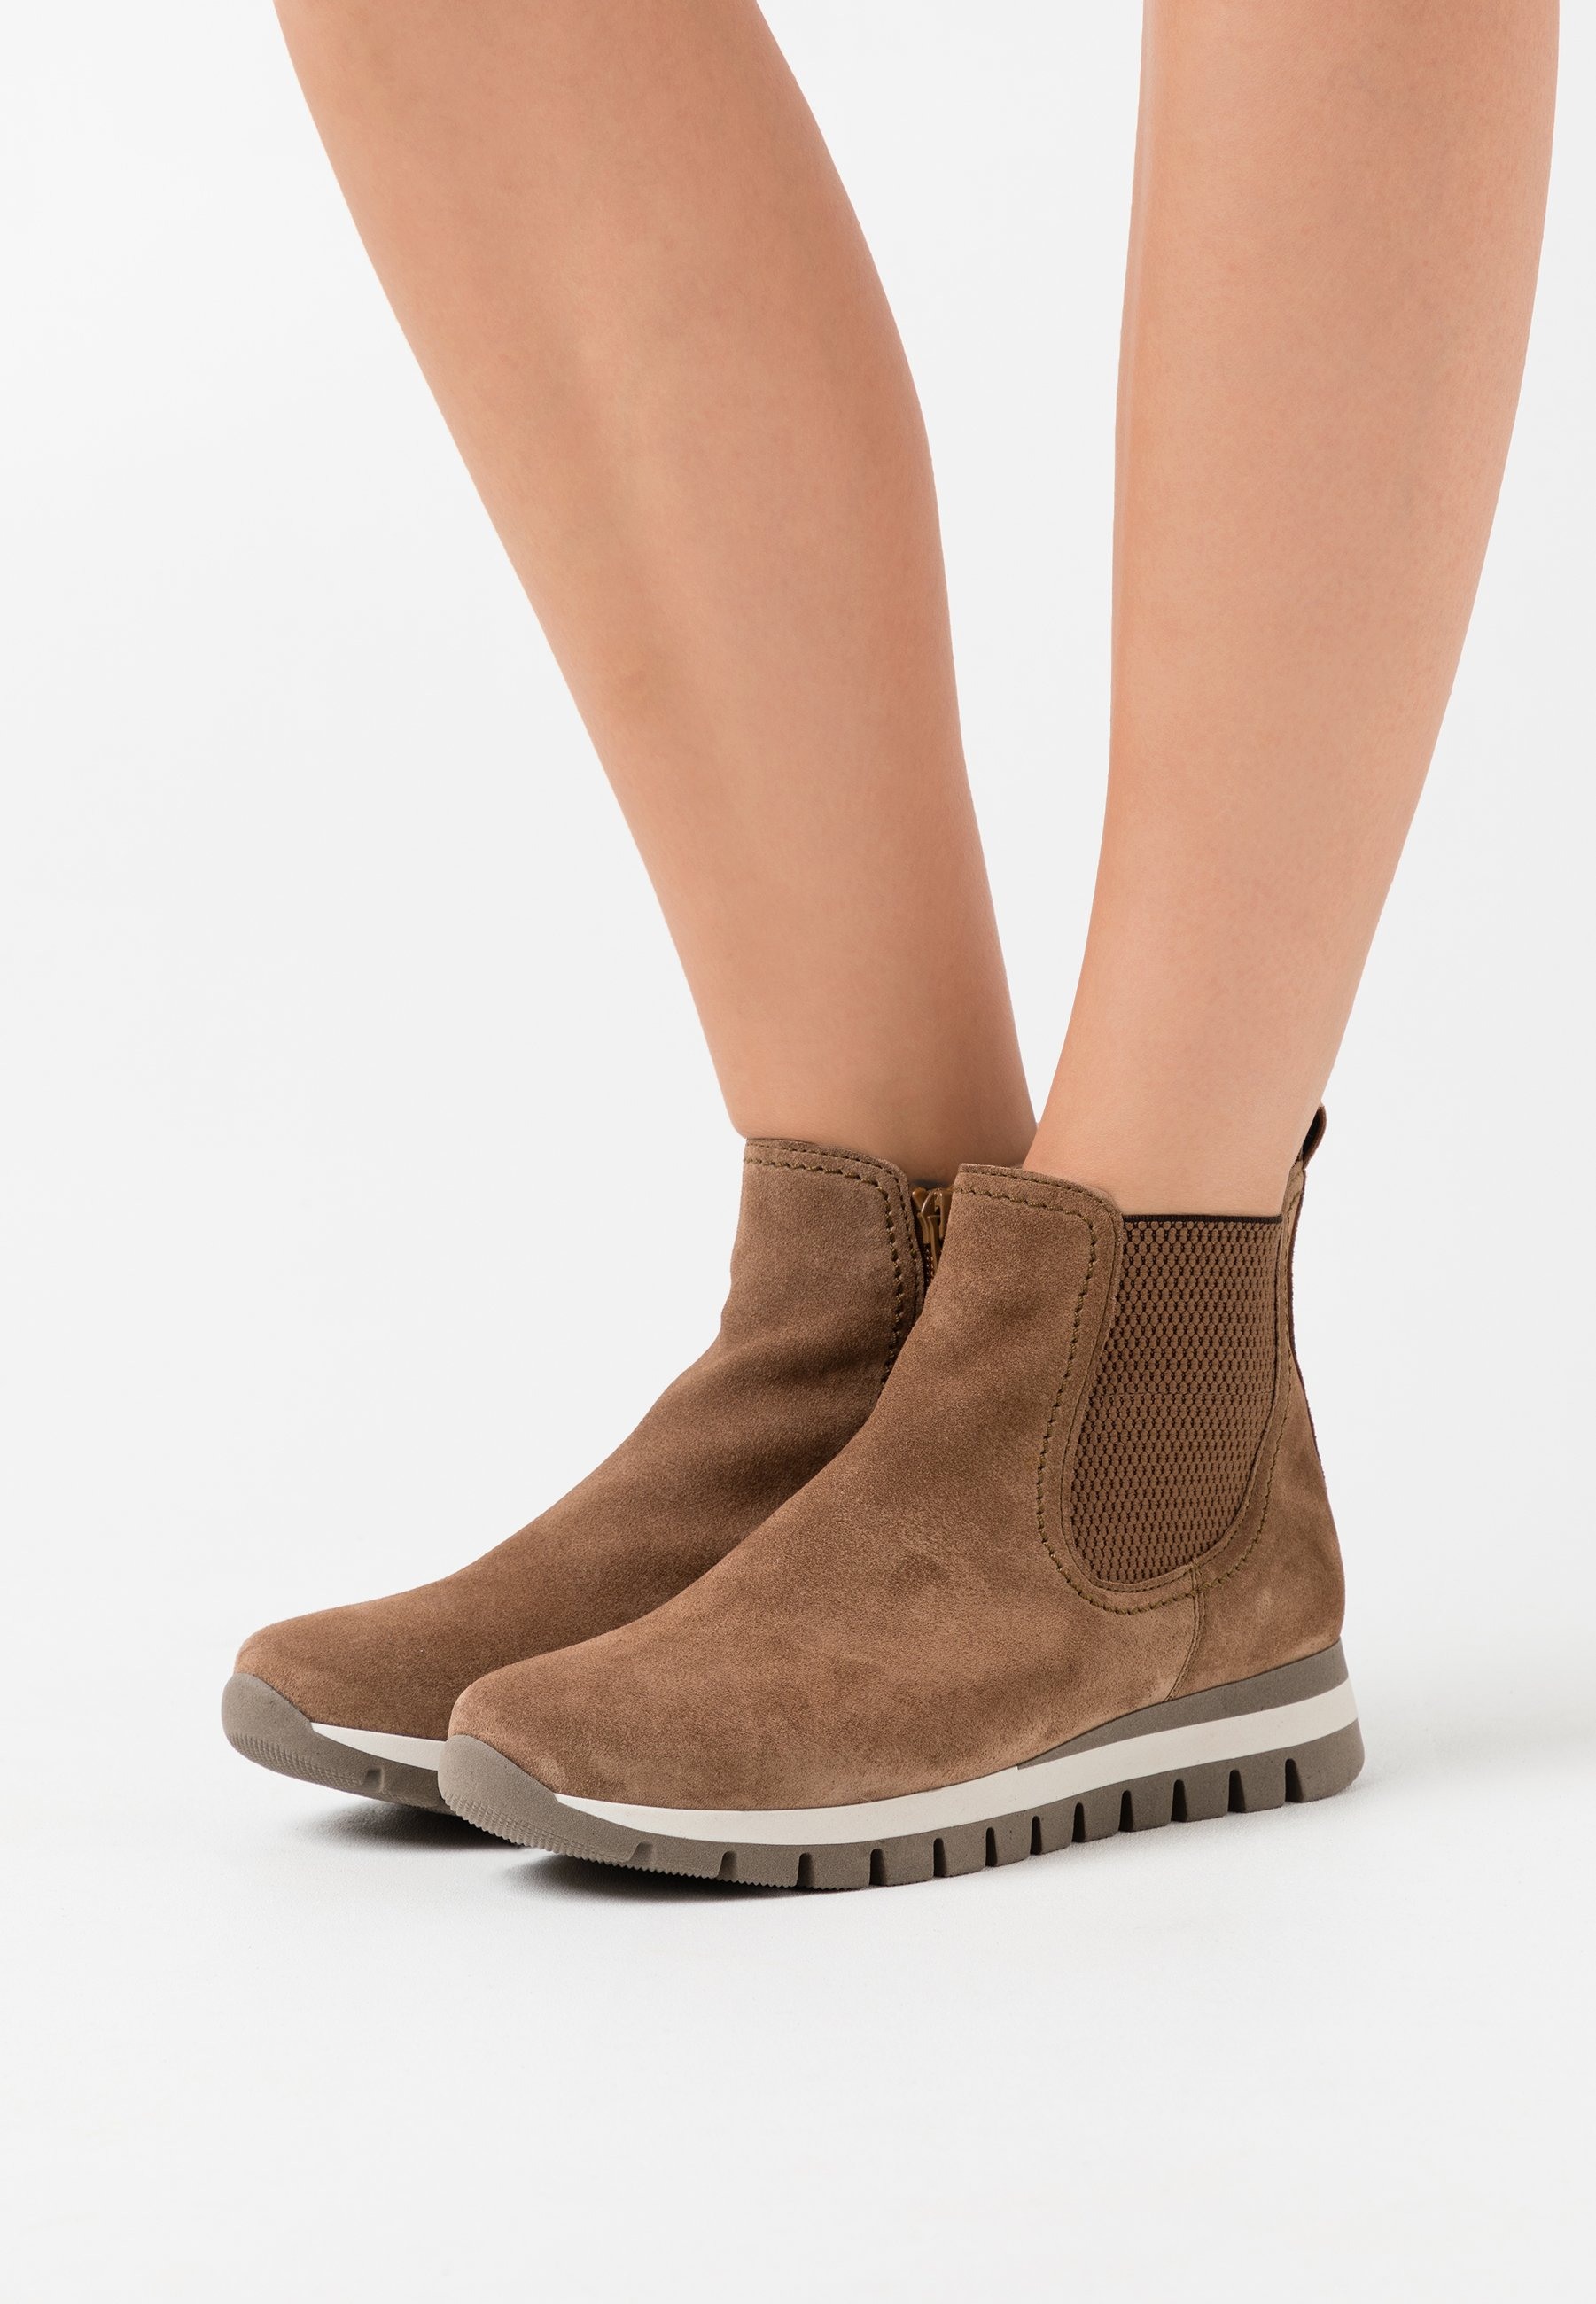 Gabor Comfort Damen Chelsea Boots Stiefelette Veloursleder Reißverschluss Schuhe